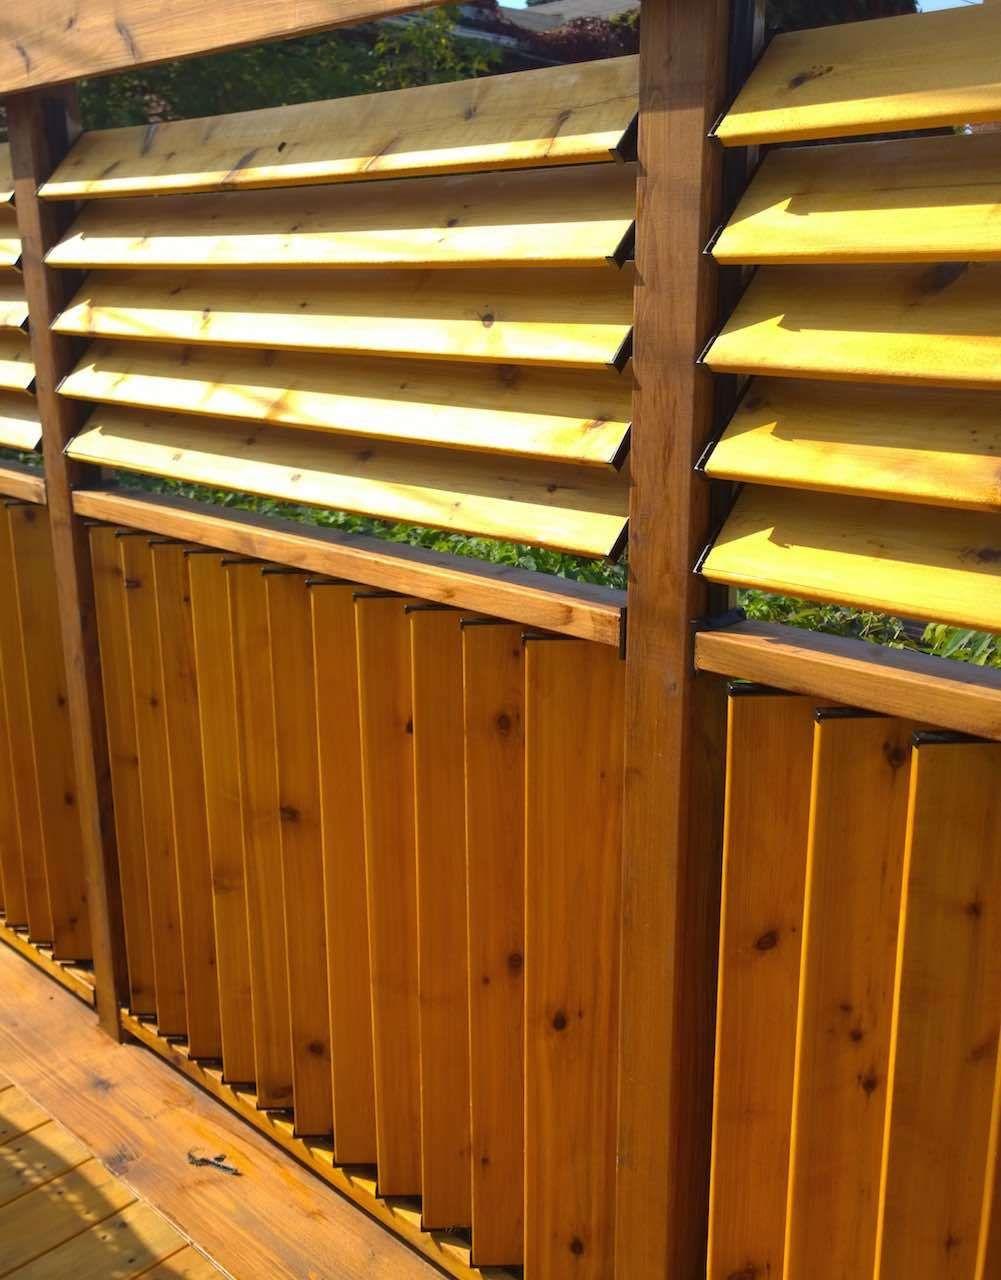 deck railings | decks | pinterest | deck railings, decks and railings